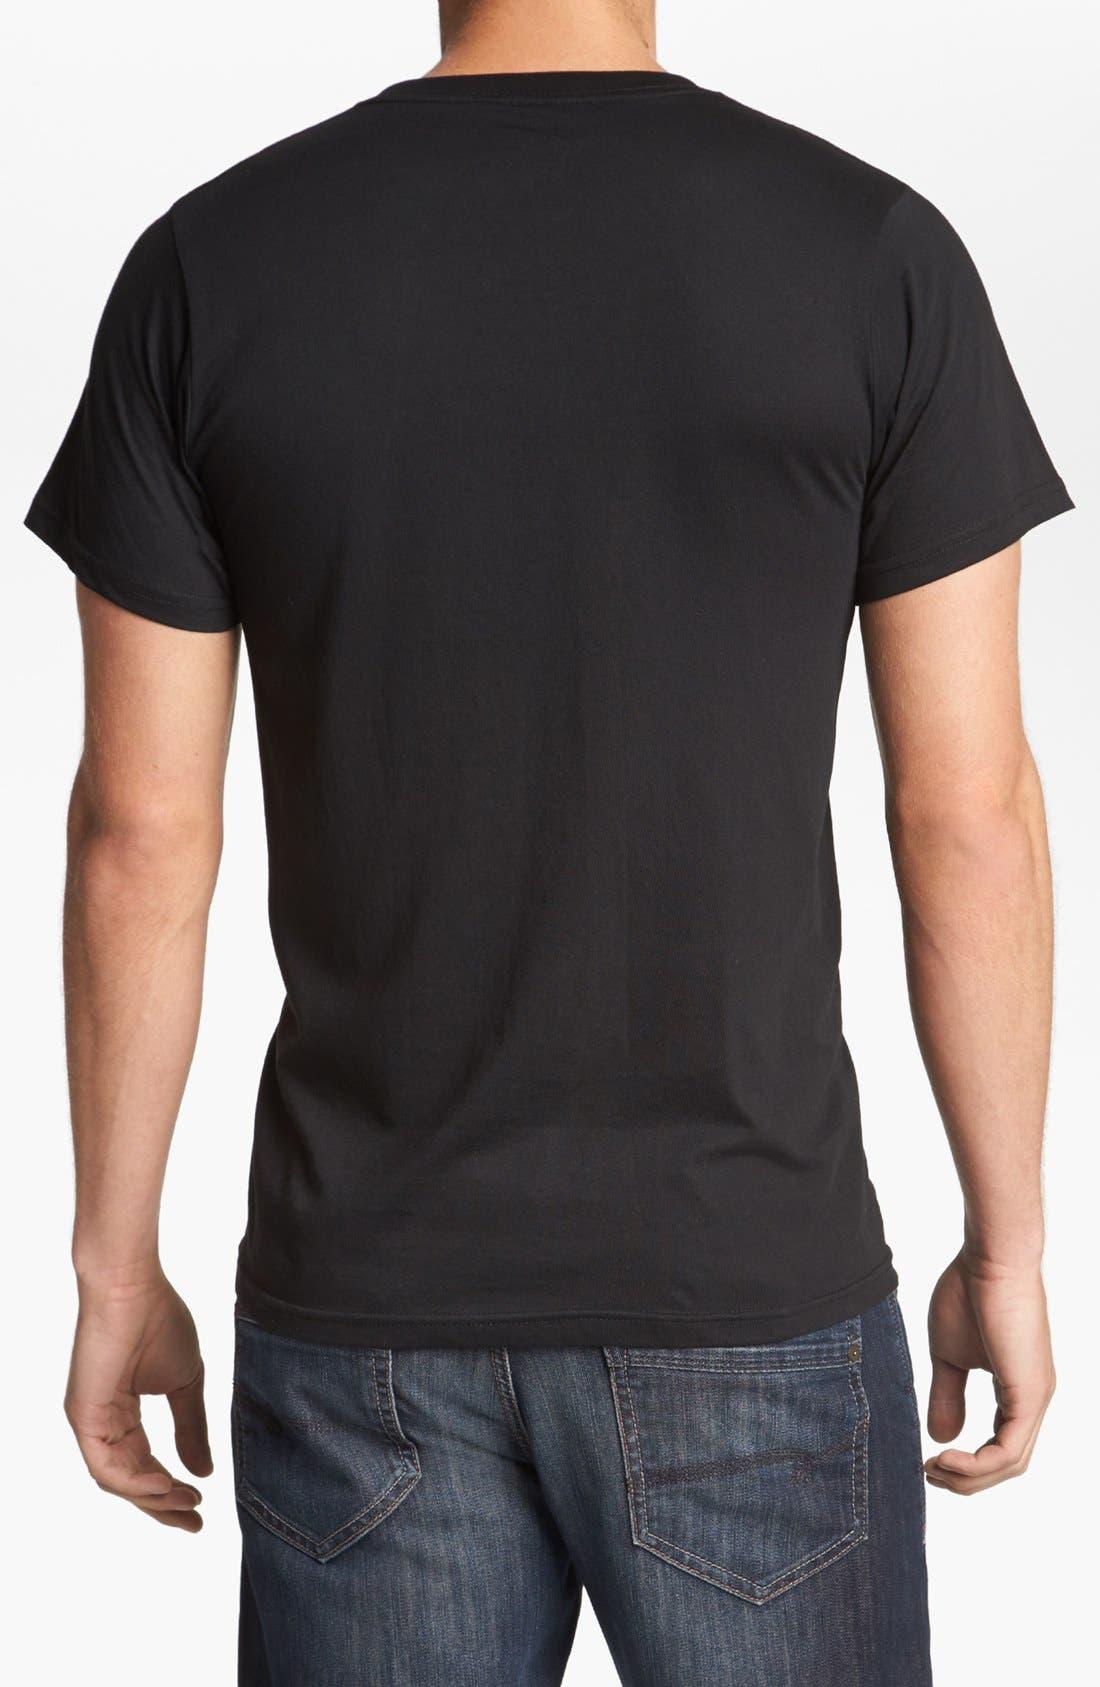 Alternate Image 2  - Horses Cut Shop 'Slim's Last Chance' T-Shirt